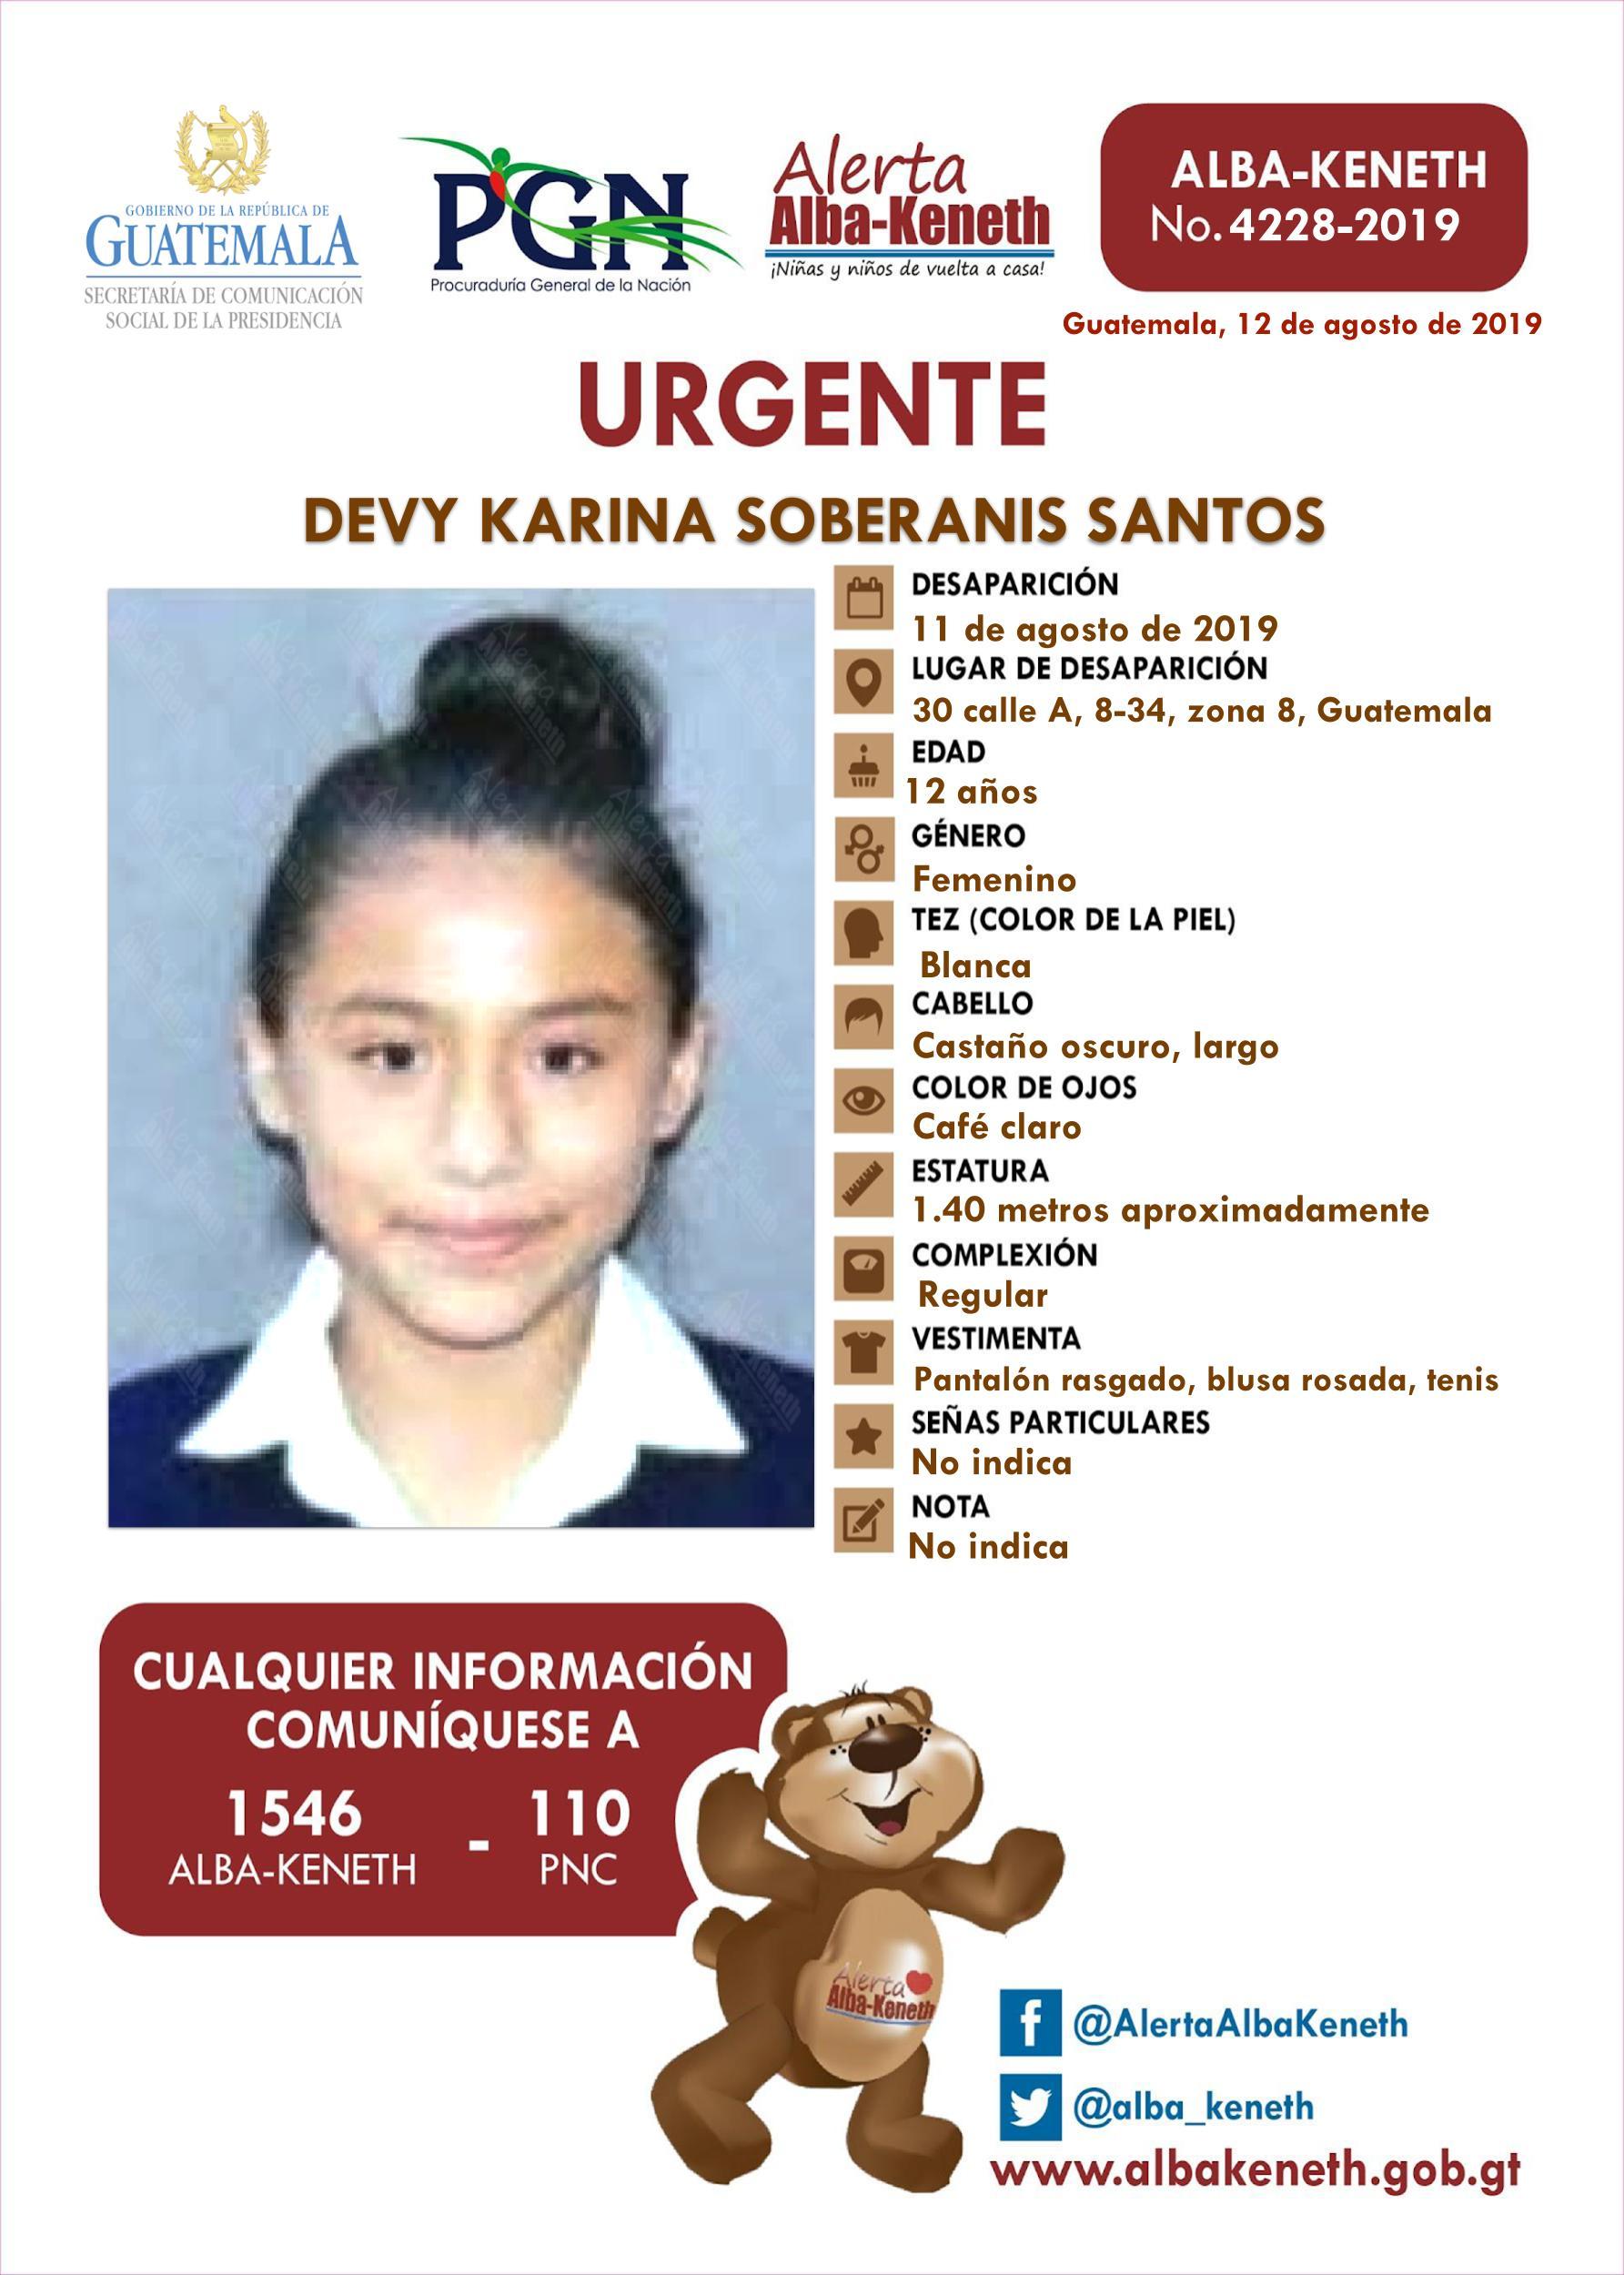 Devy Karina Soberanis Santos